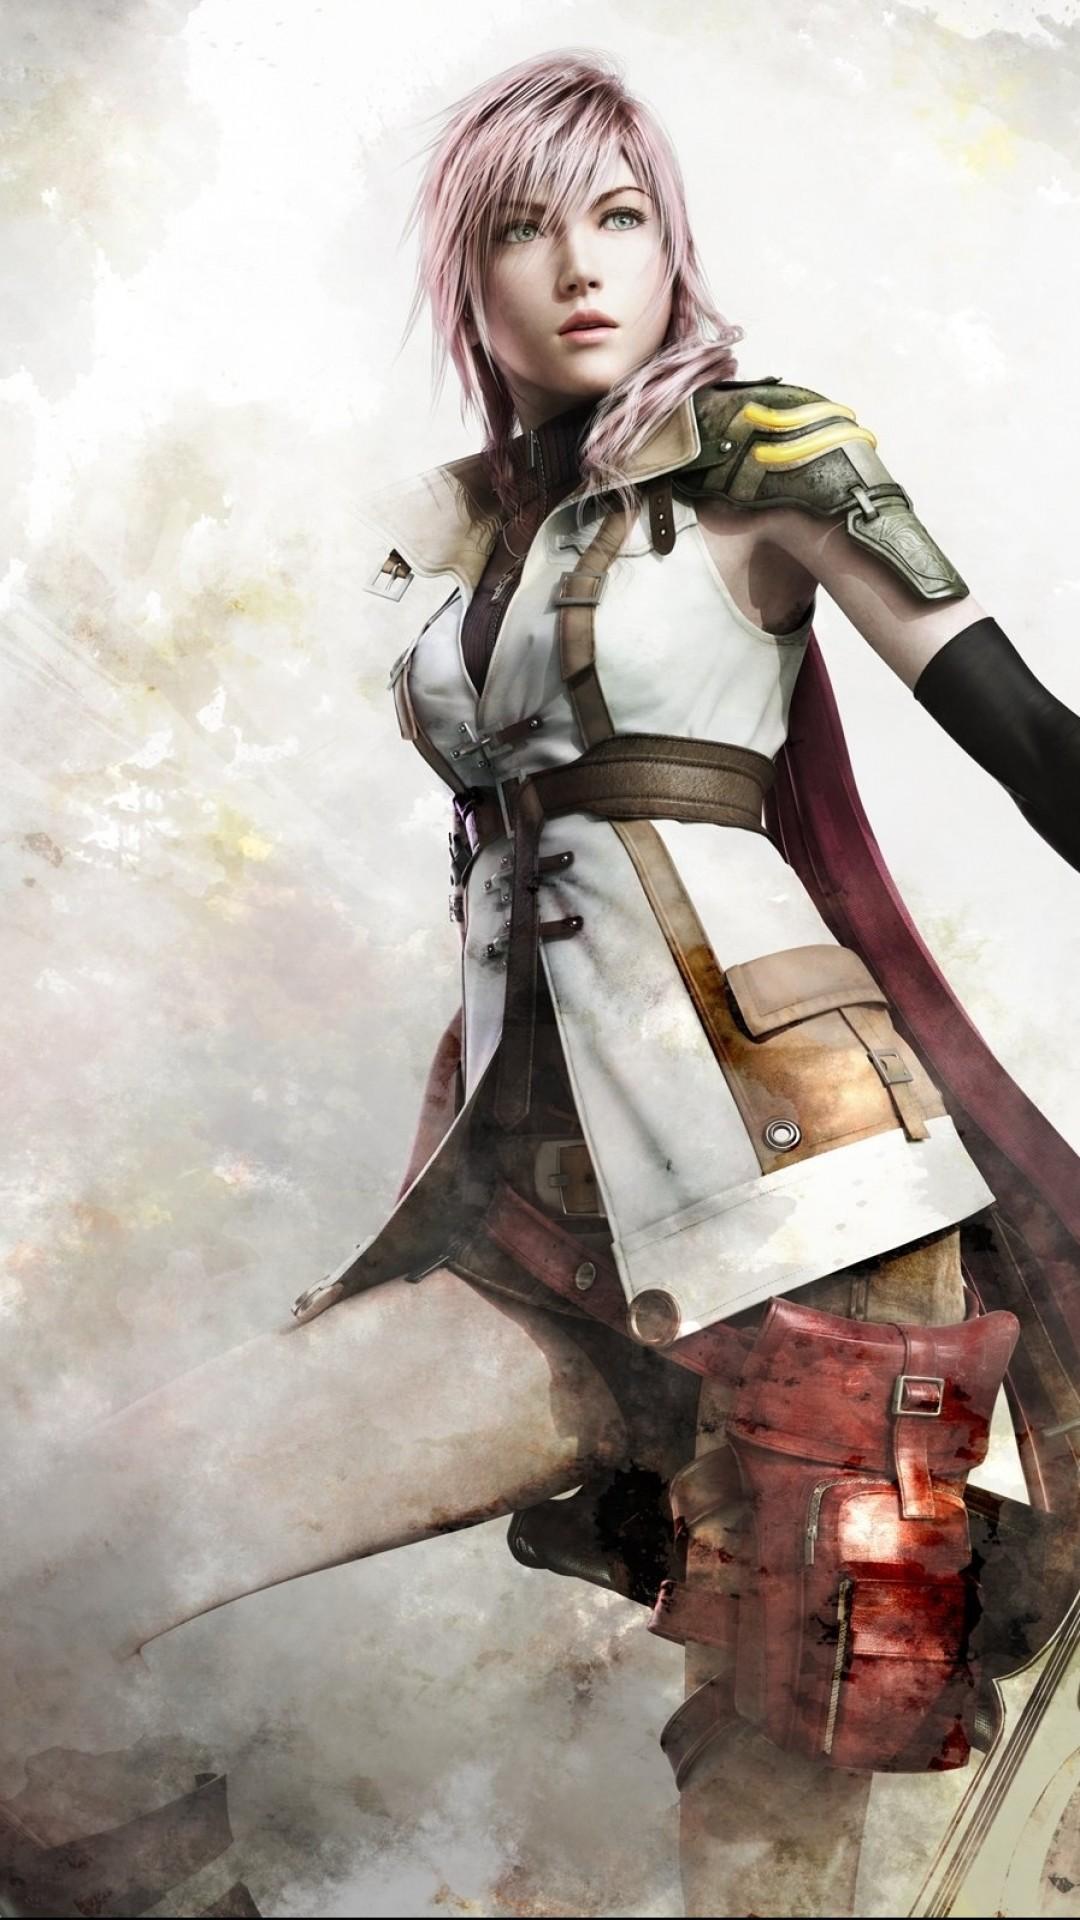 Final Fantasy Xiii Wallpaper 70 Images